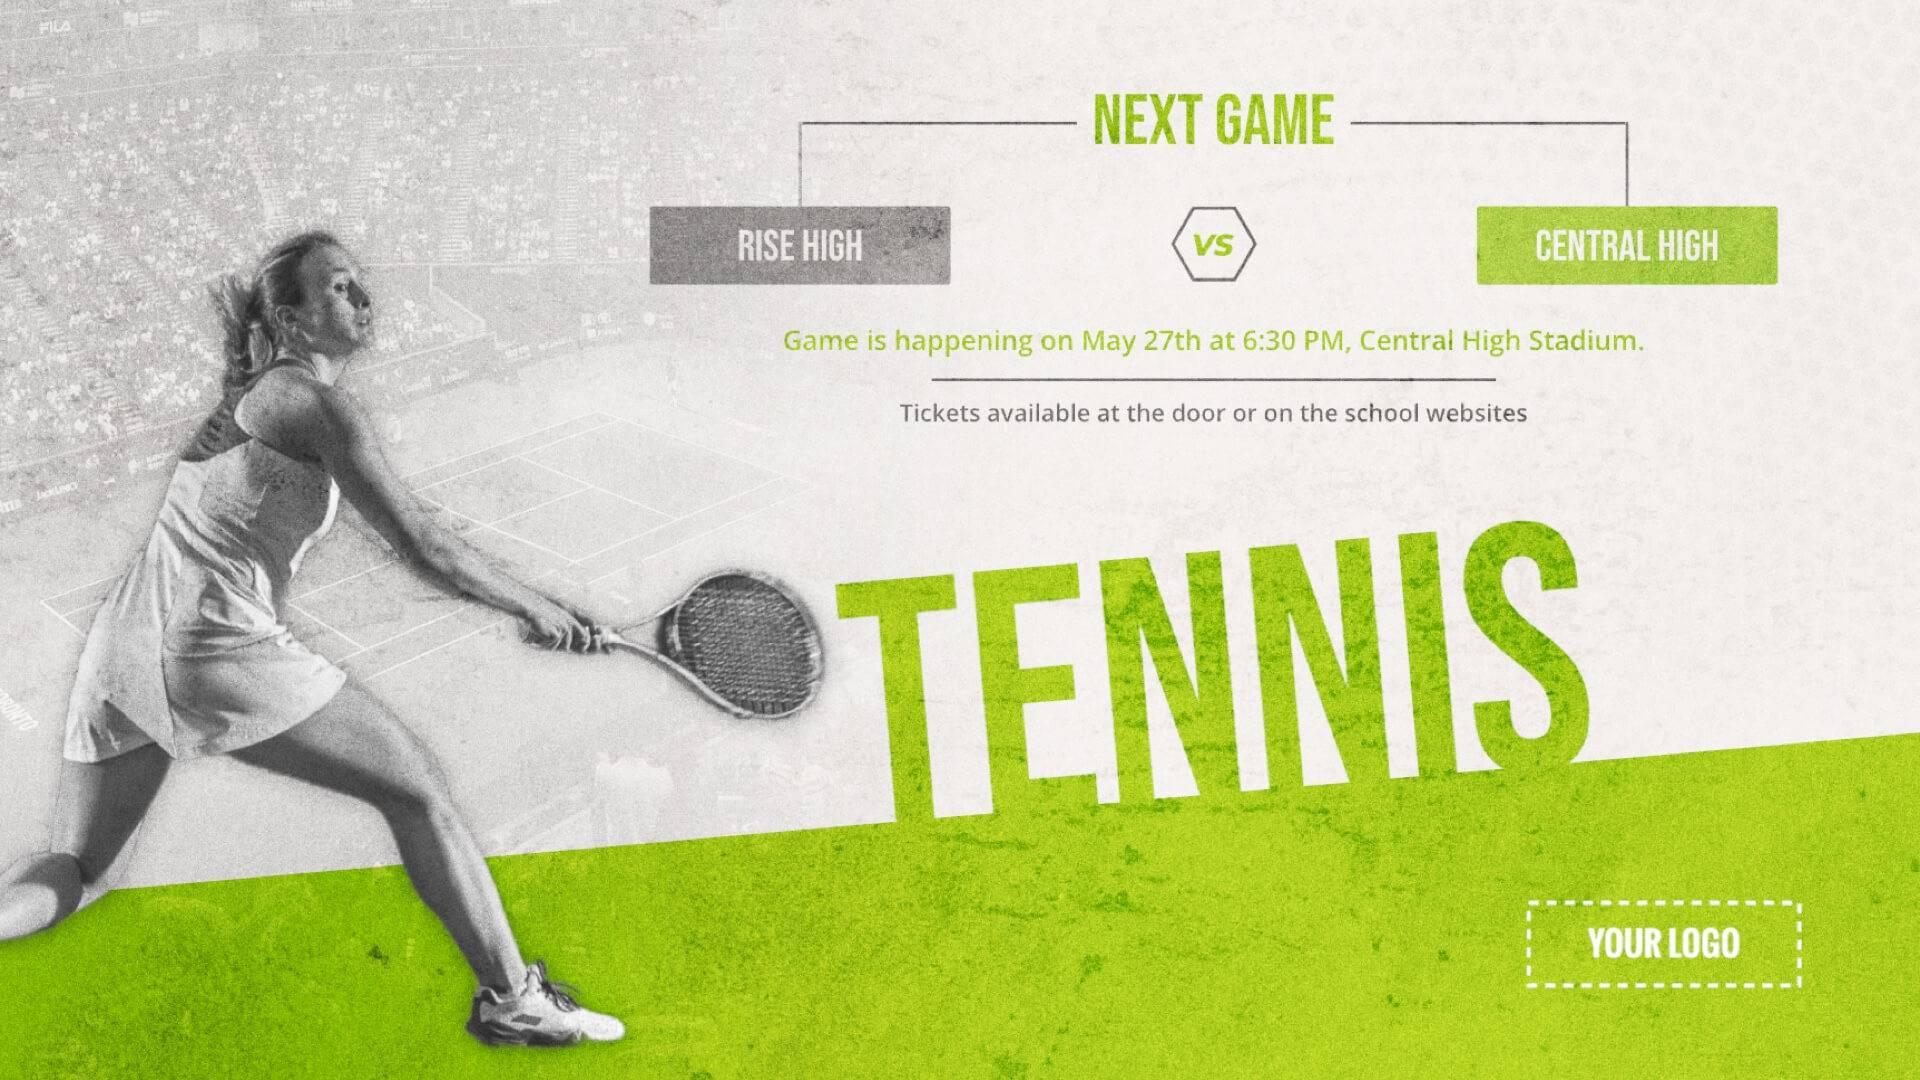 Tennis Tournament - Sports Digital Signage Template